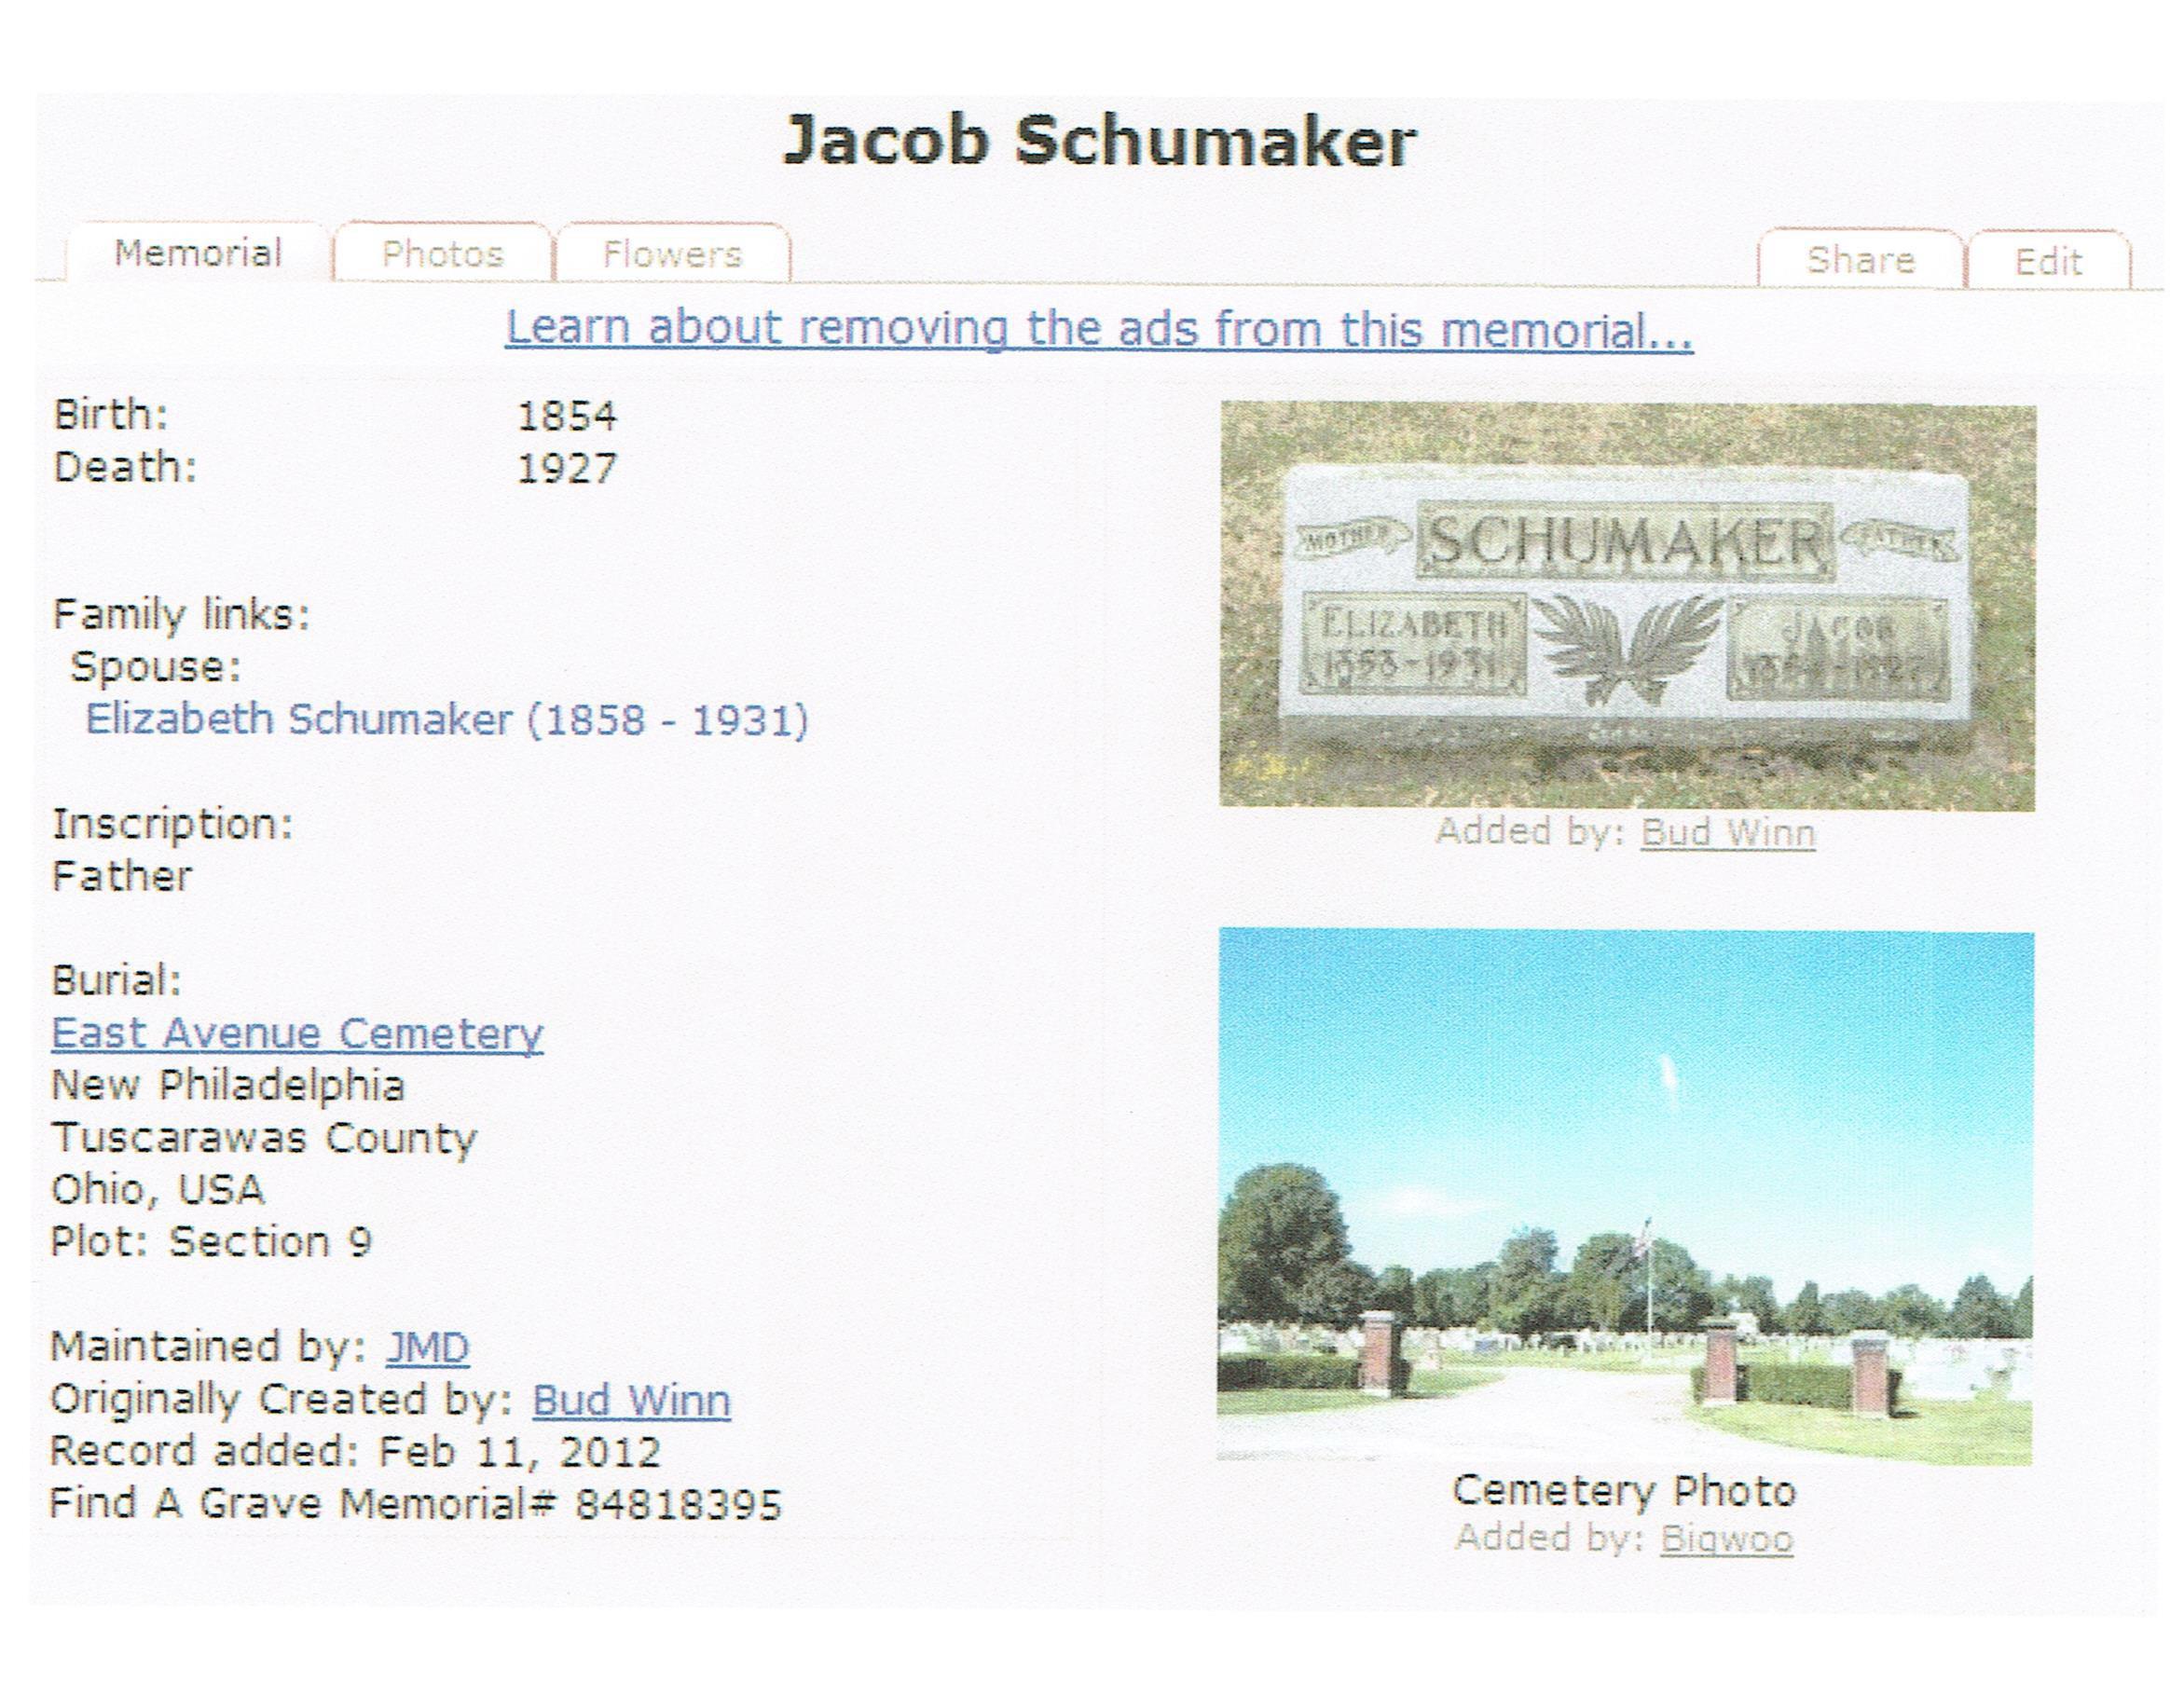 Jacob Schumacher